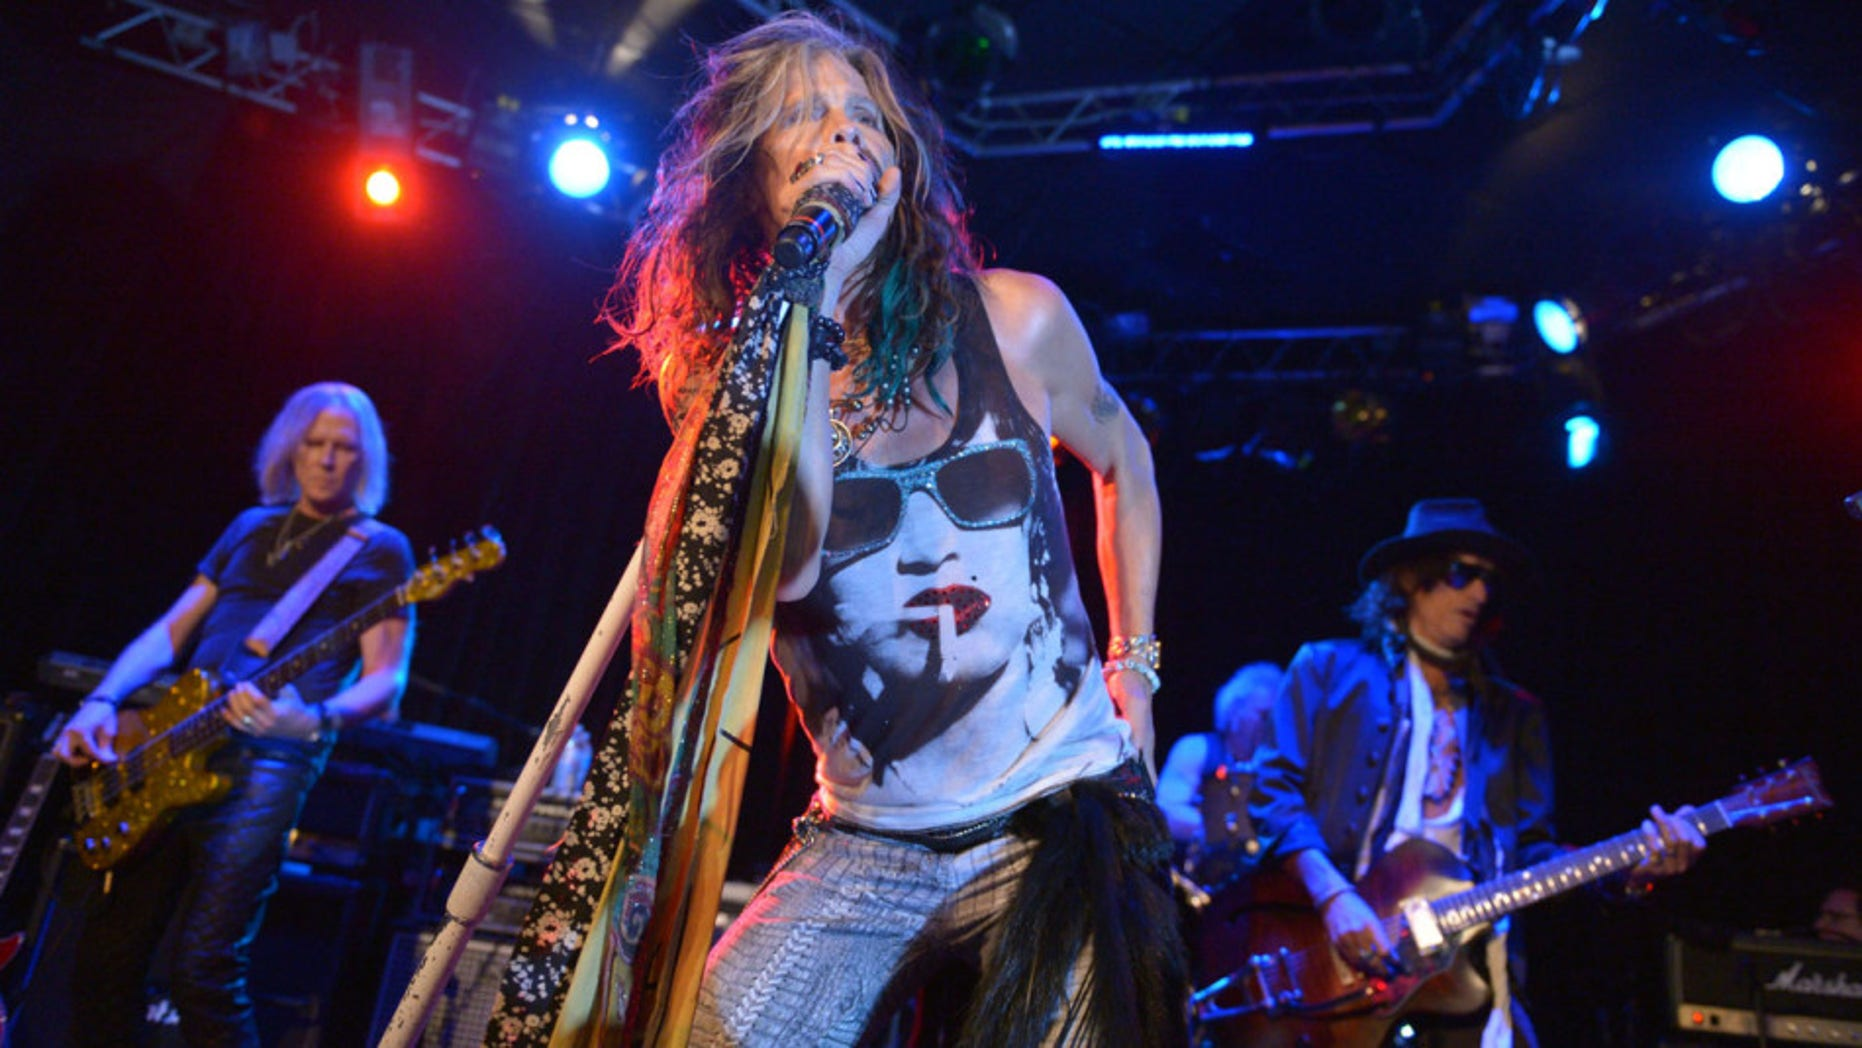 Aerosmith rocks the house at the world famous Whisky A Go Go in West Hollywood.